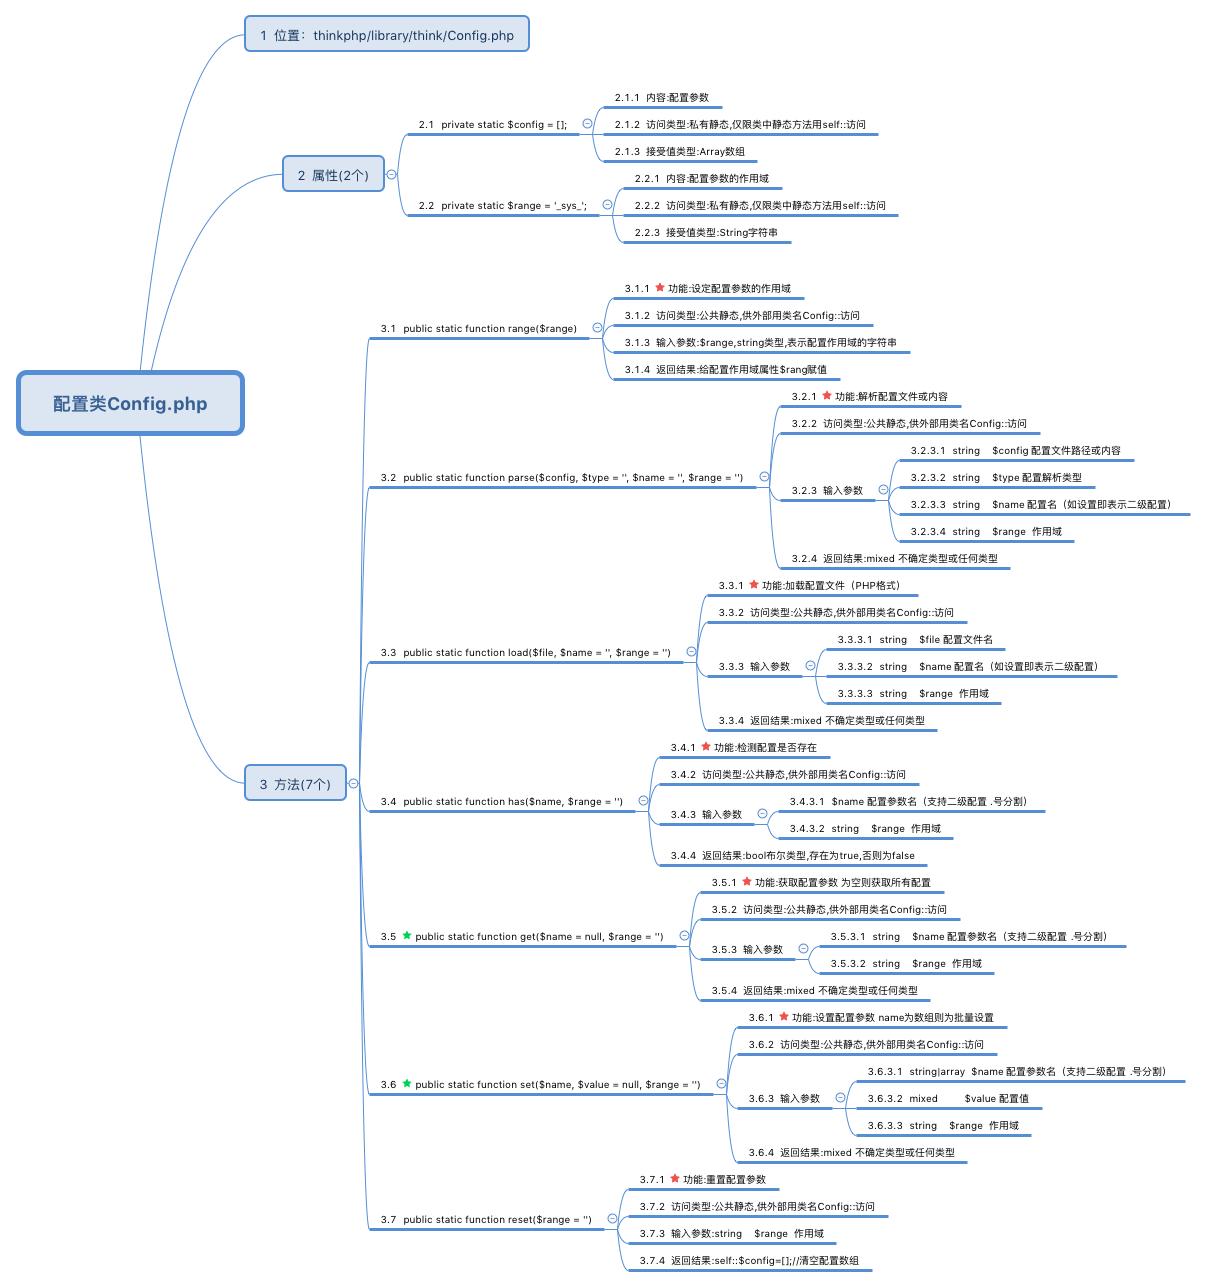 图解ThinkPHP5框架(三):配置类Config.php源码解读